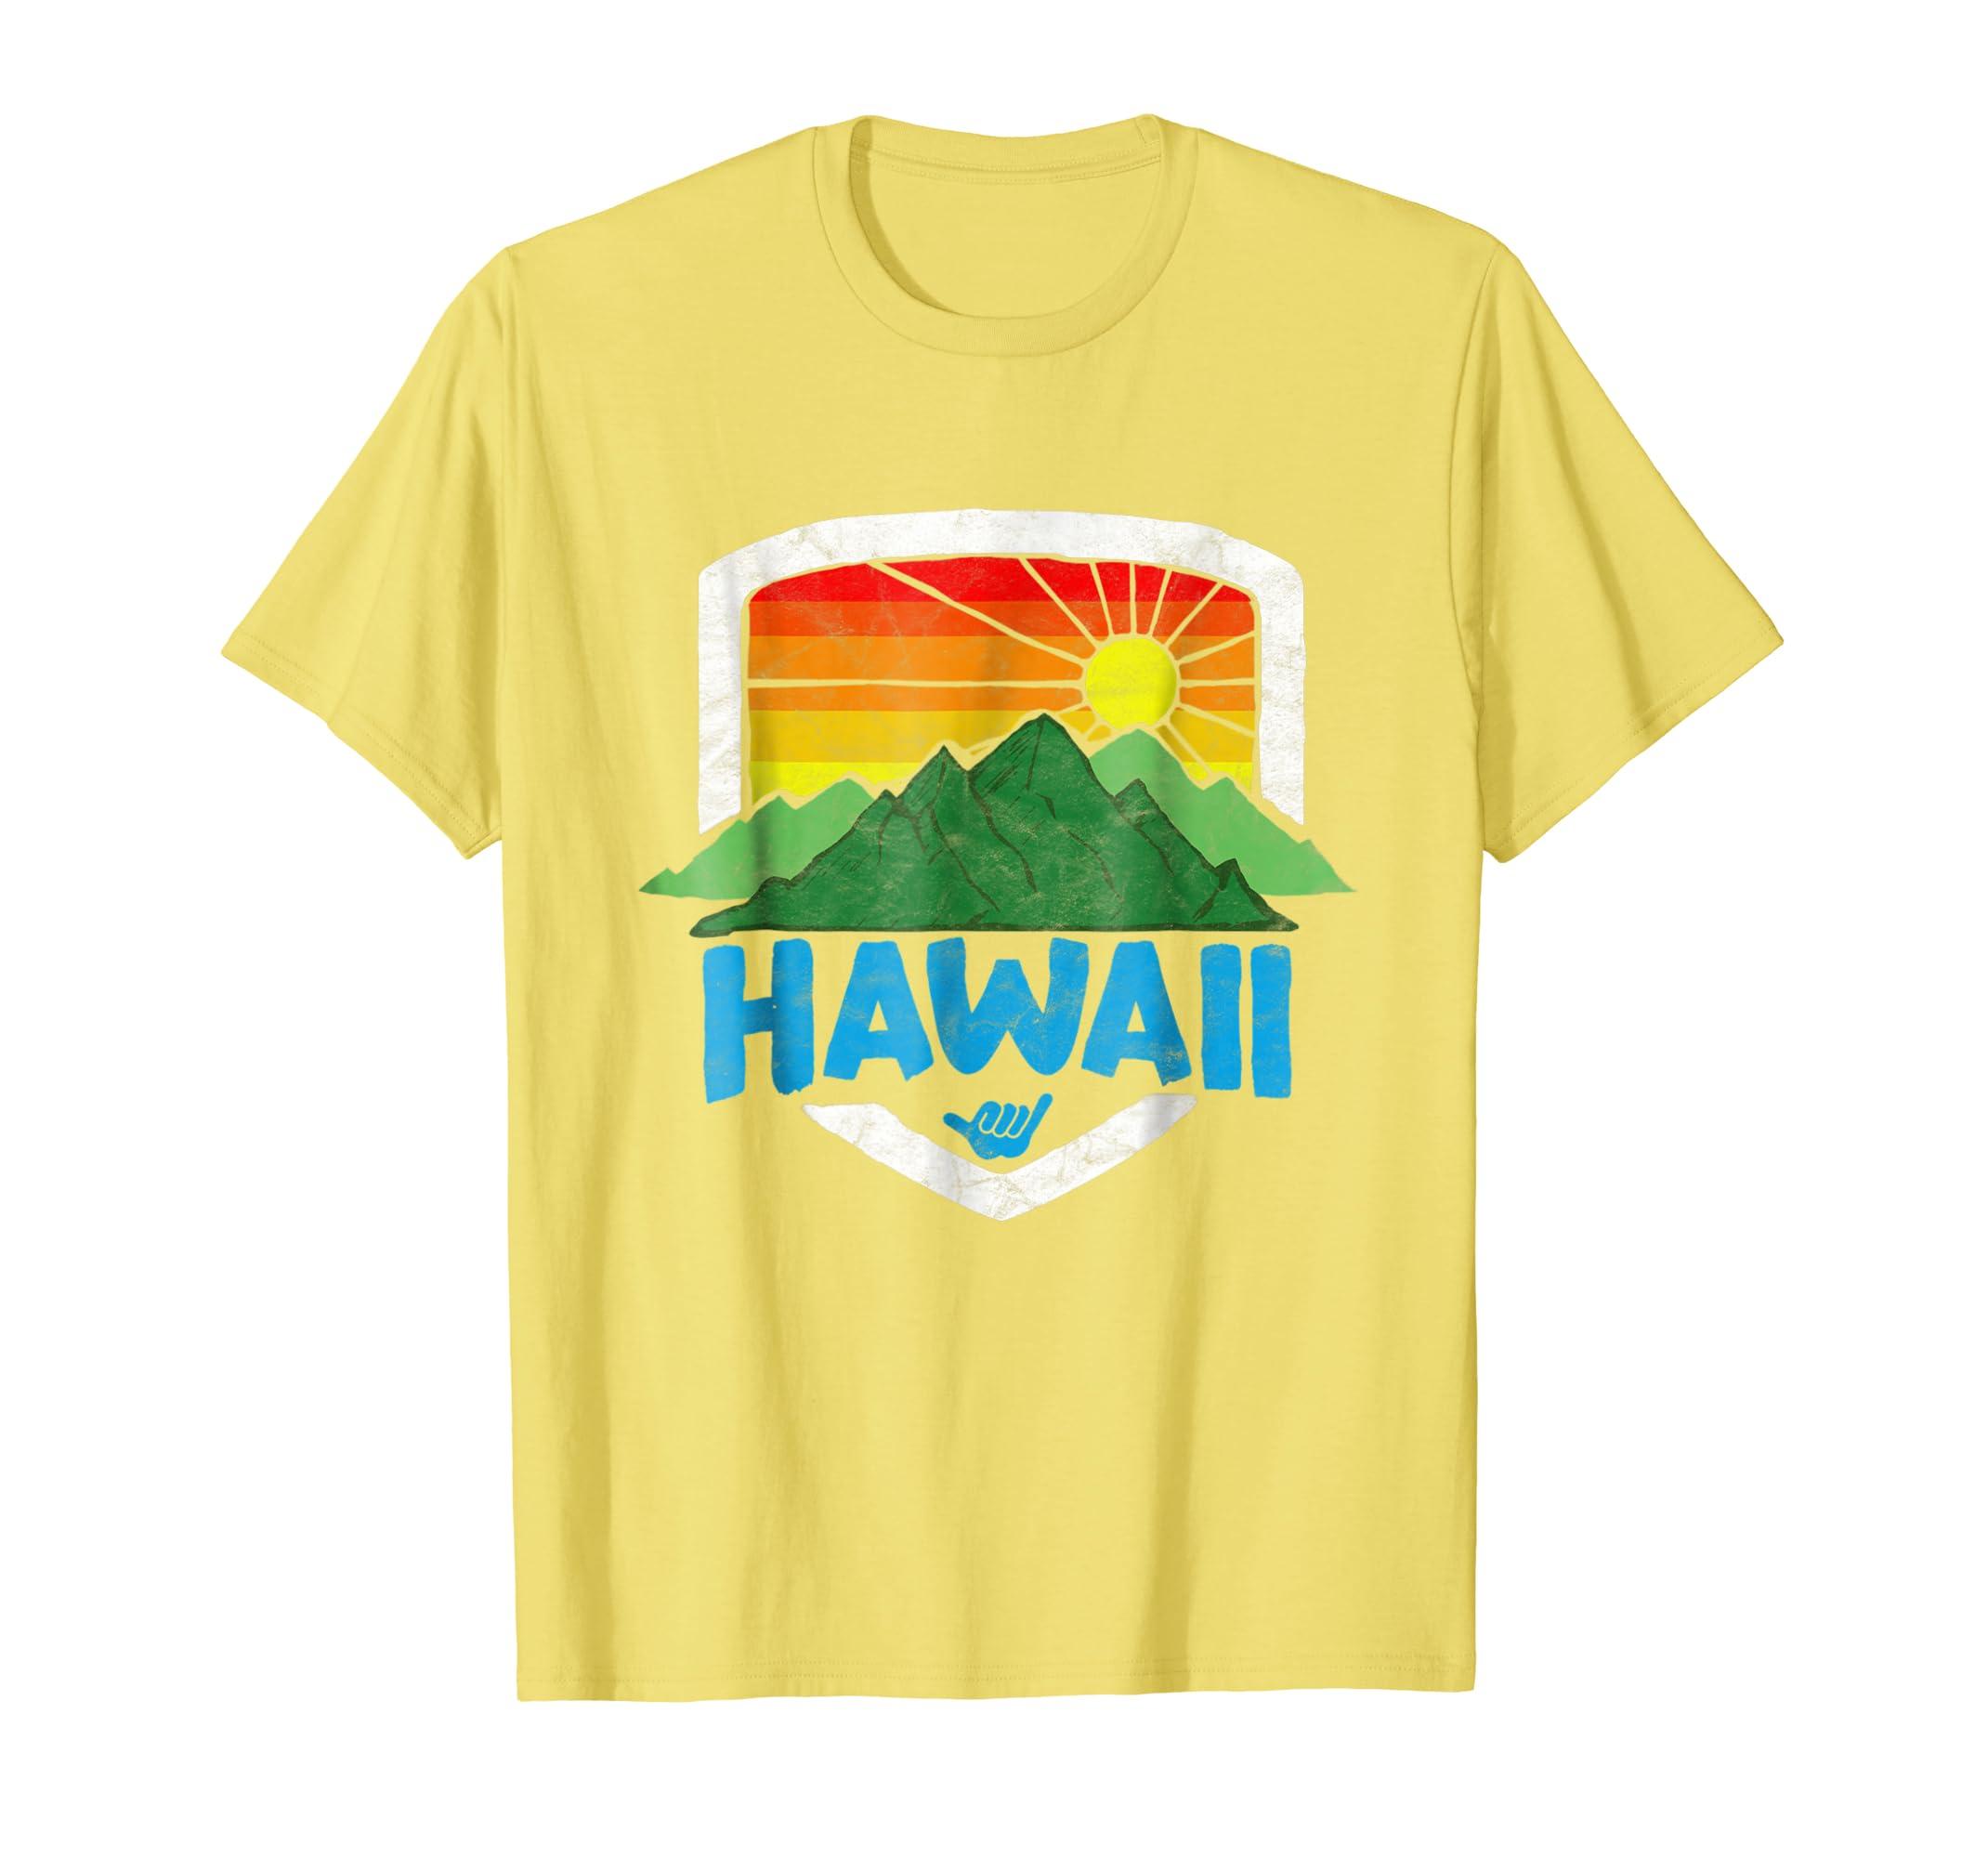 169ef24e Amazon.com: Vintage Hawaii Graphic Tee - Retro Rainbow Sun Shirt: Clothing